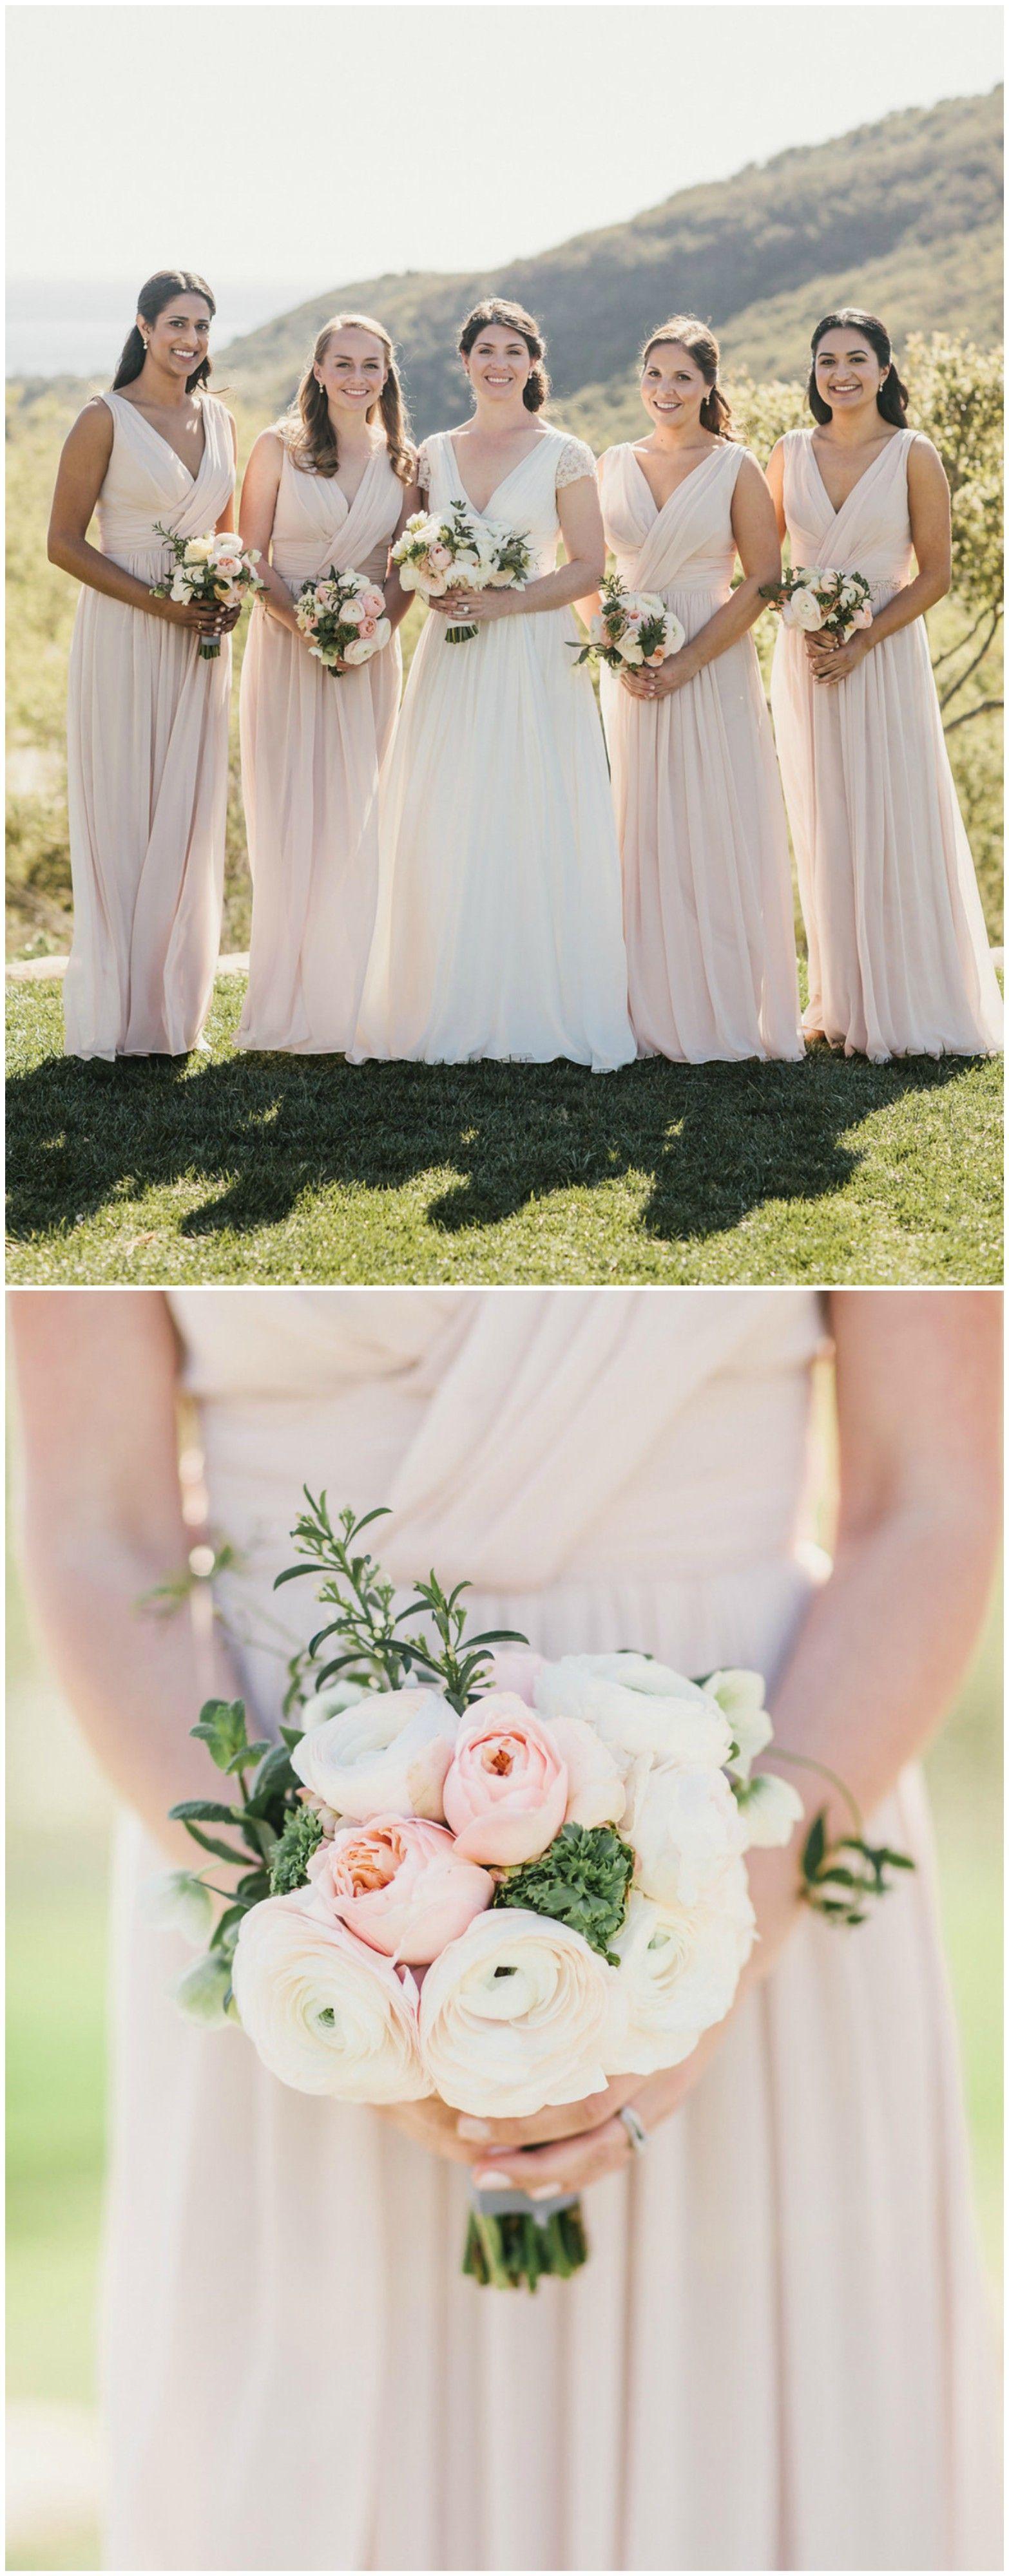 Pastel pink bridesmaid dress  The Smarter Way to Wed  Long bridesmaid dresses Bridal parties and